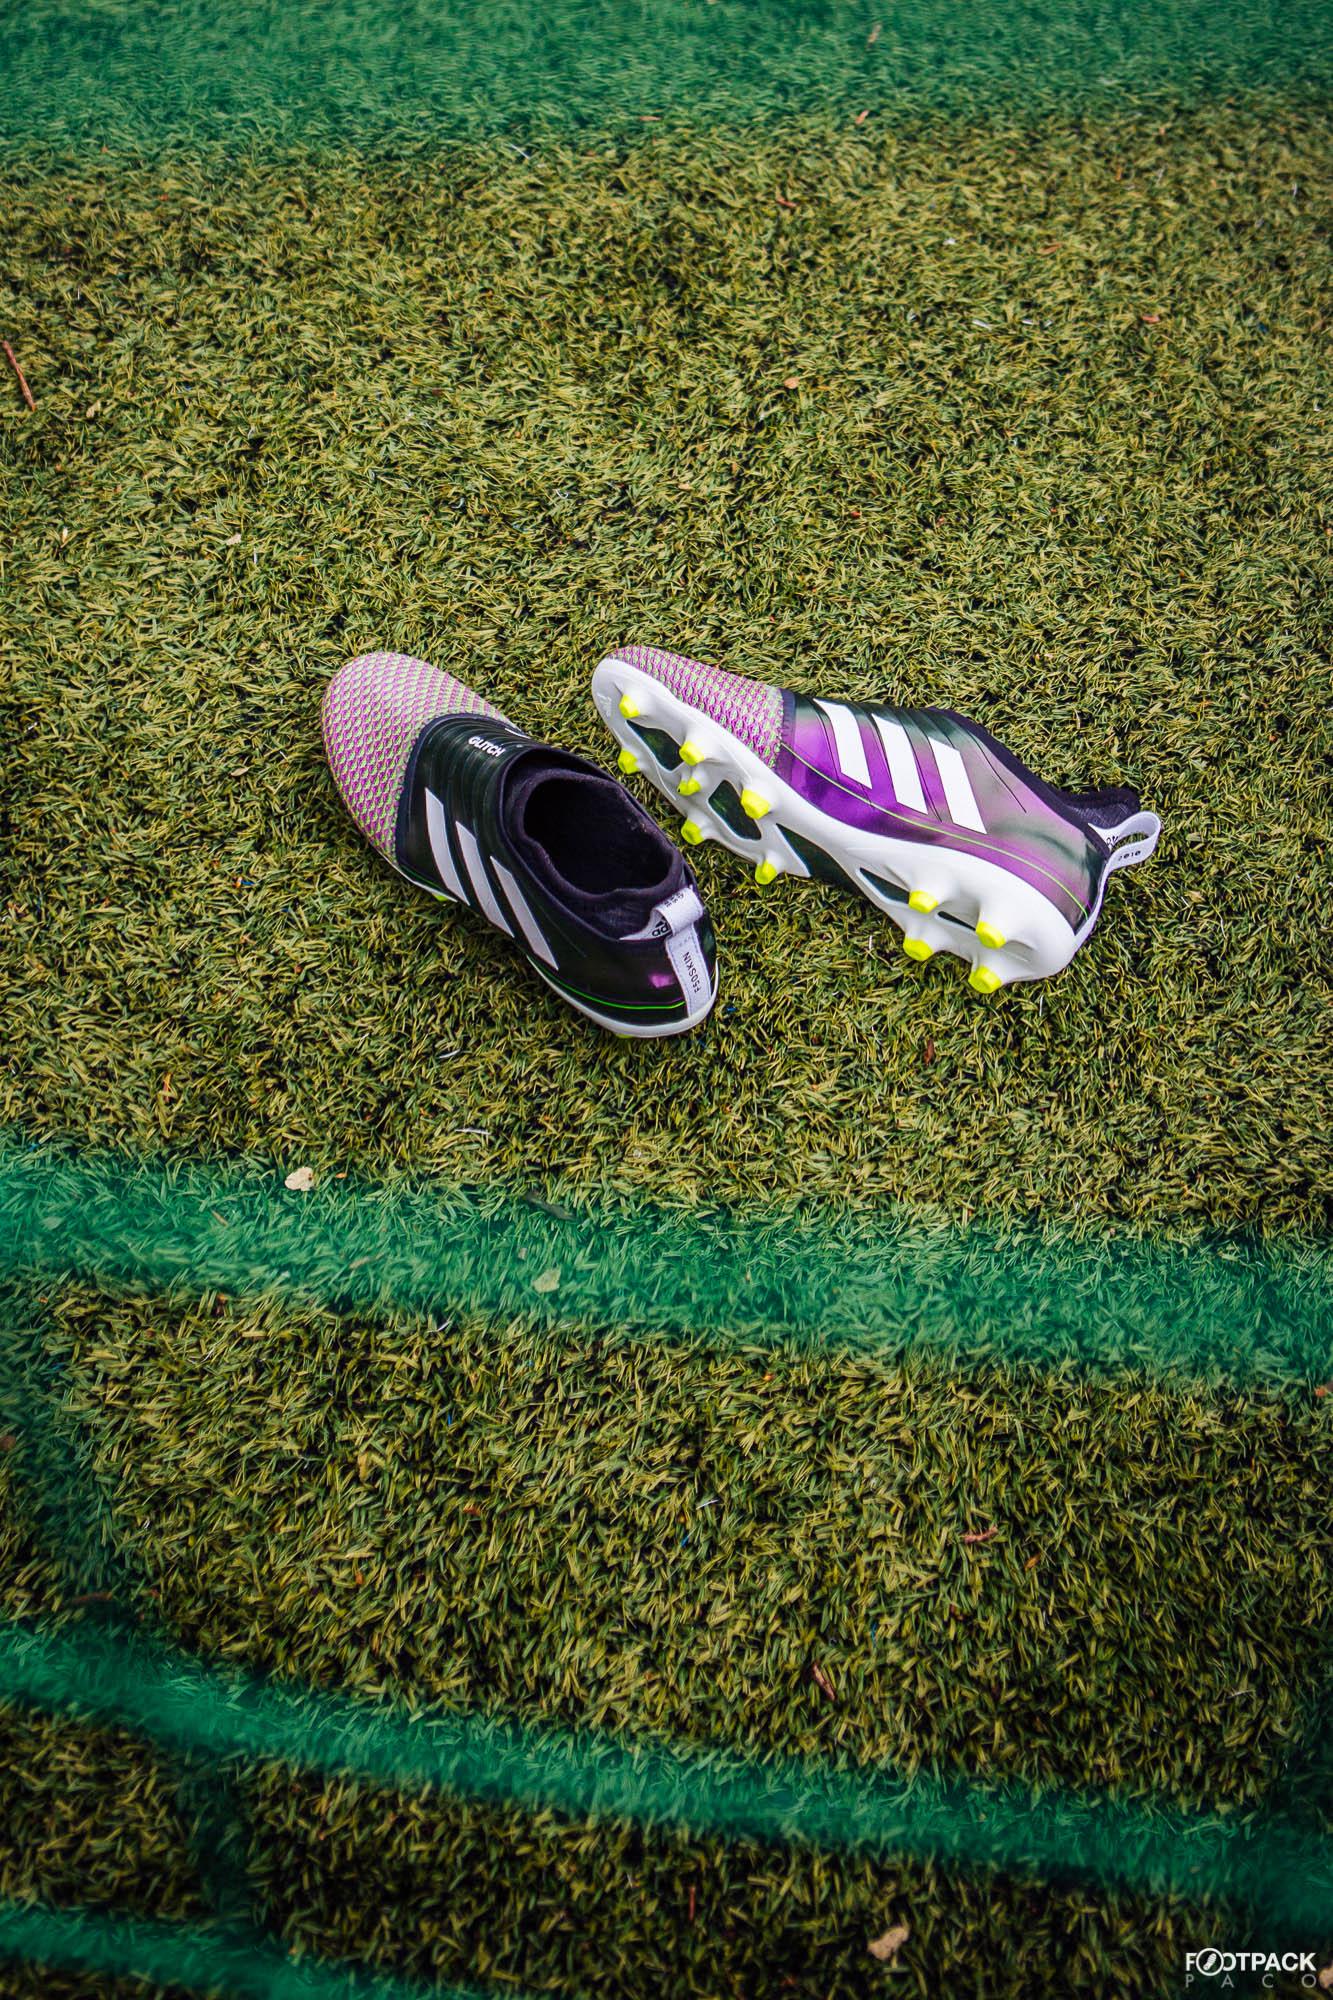 Chaussures-football-adidas-glitch-f50-mai-2018-7